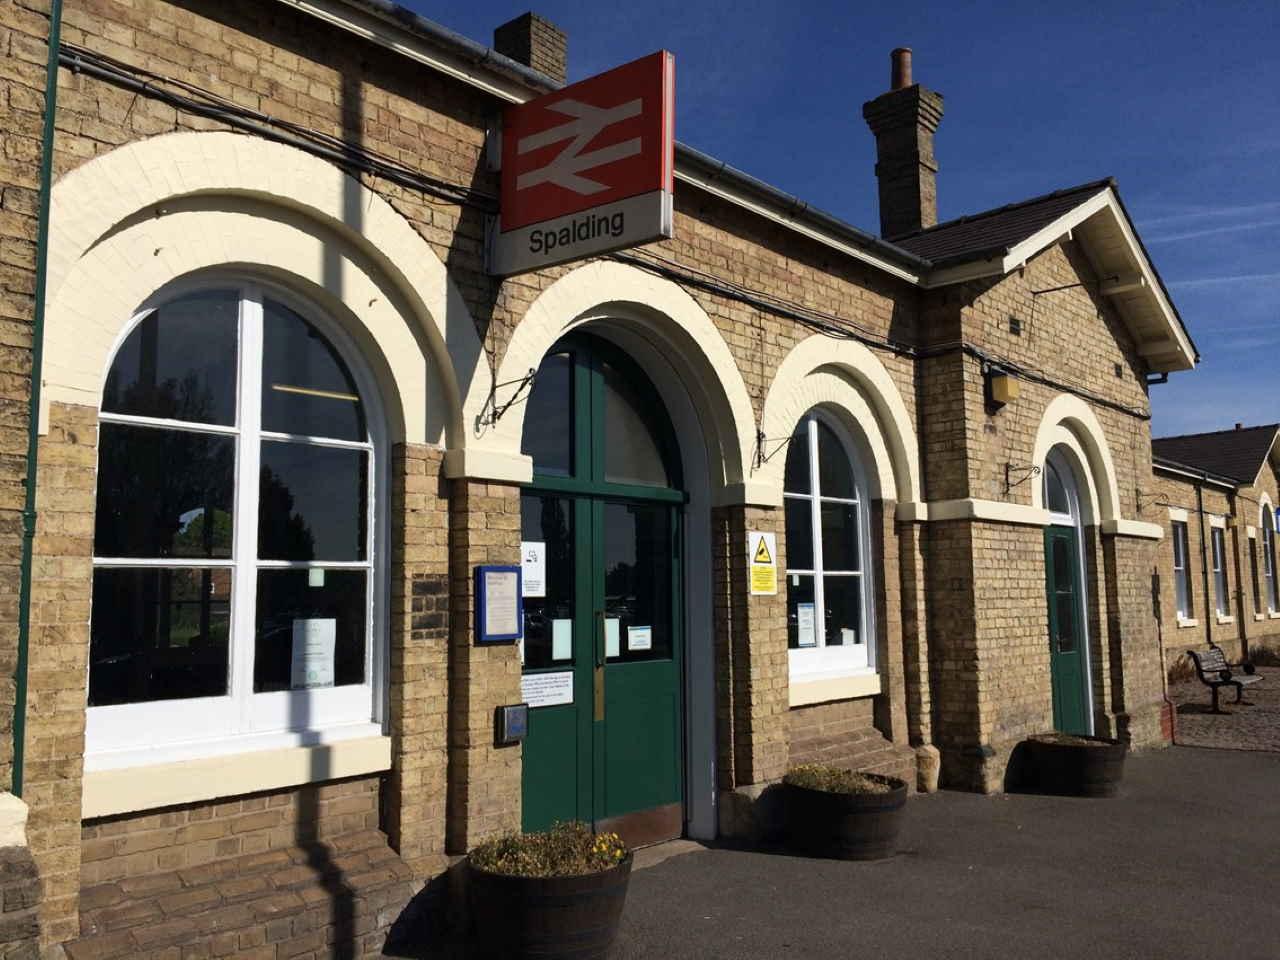 Spalding railway station lift upgrade